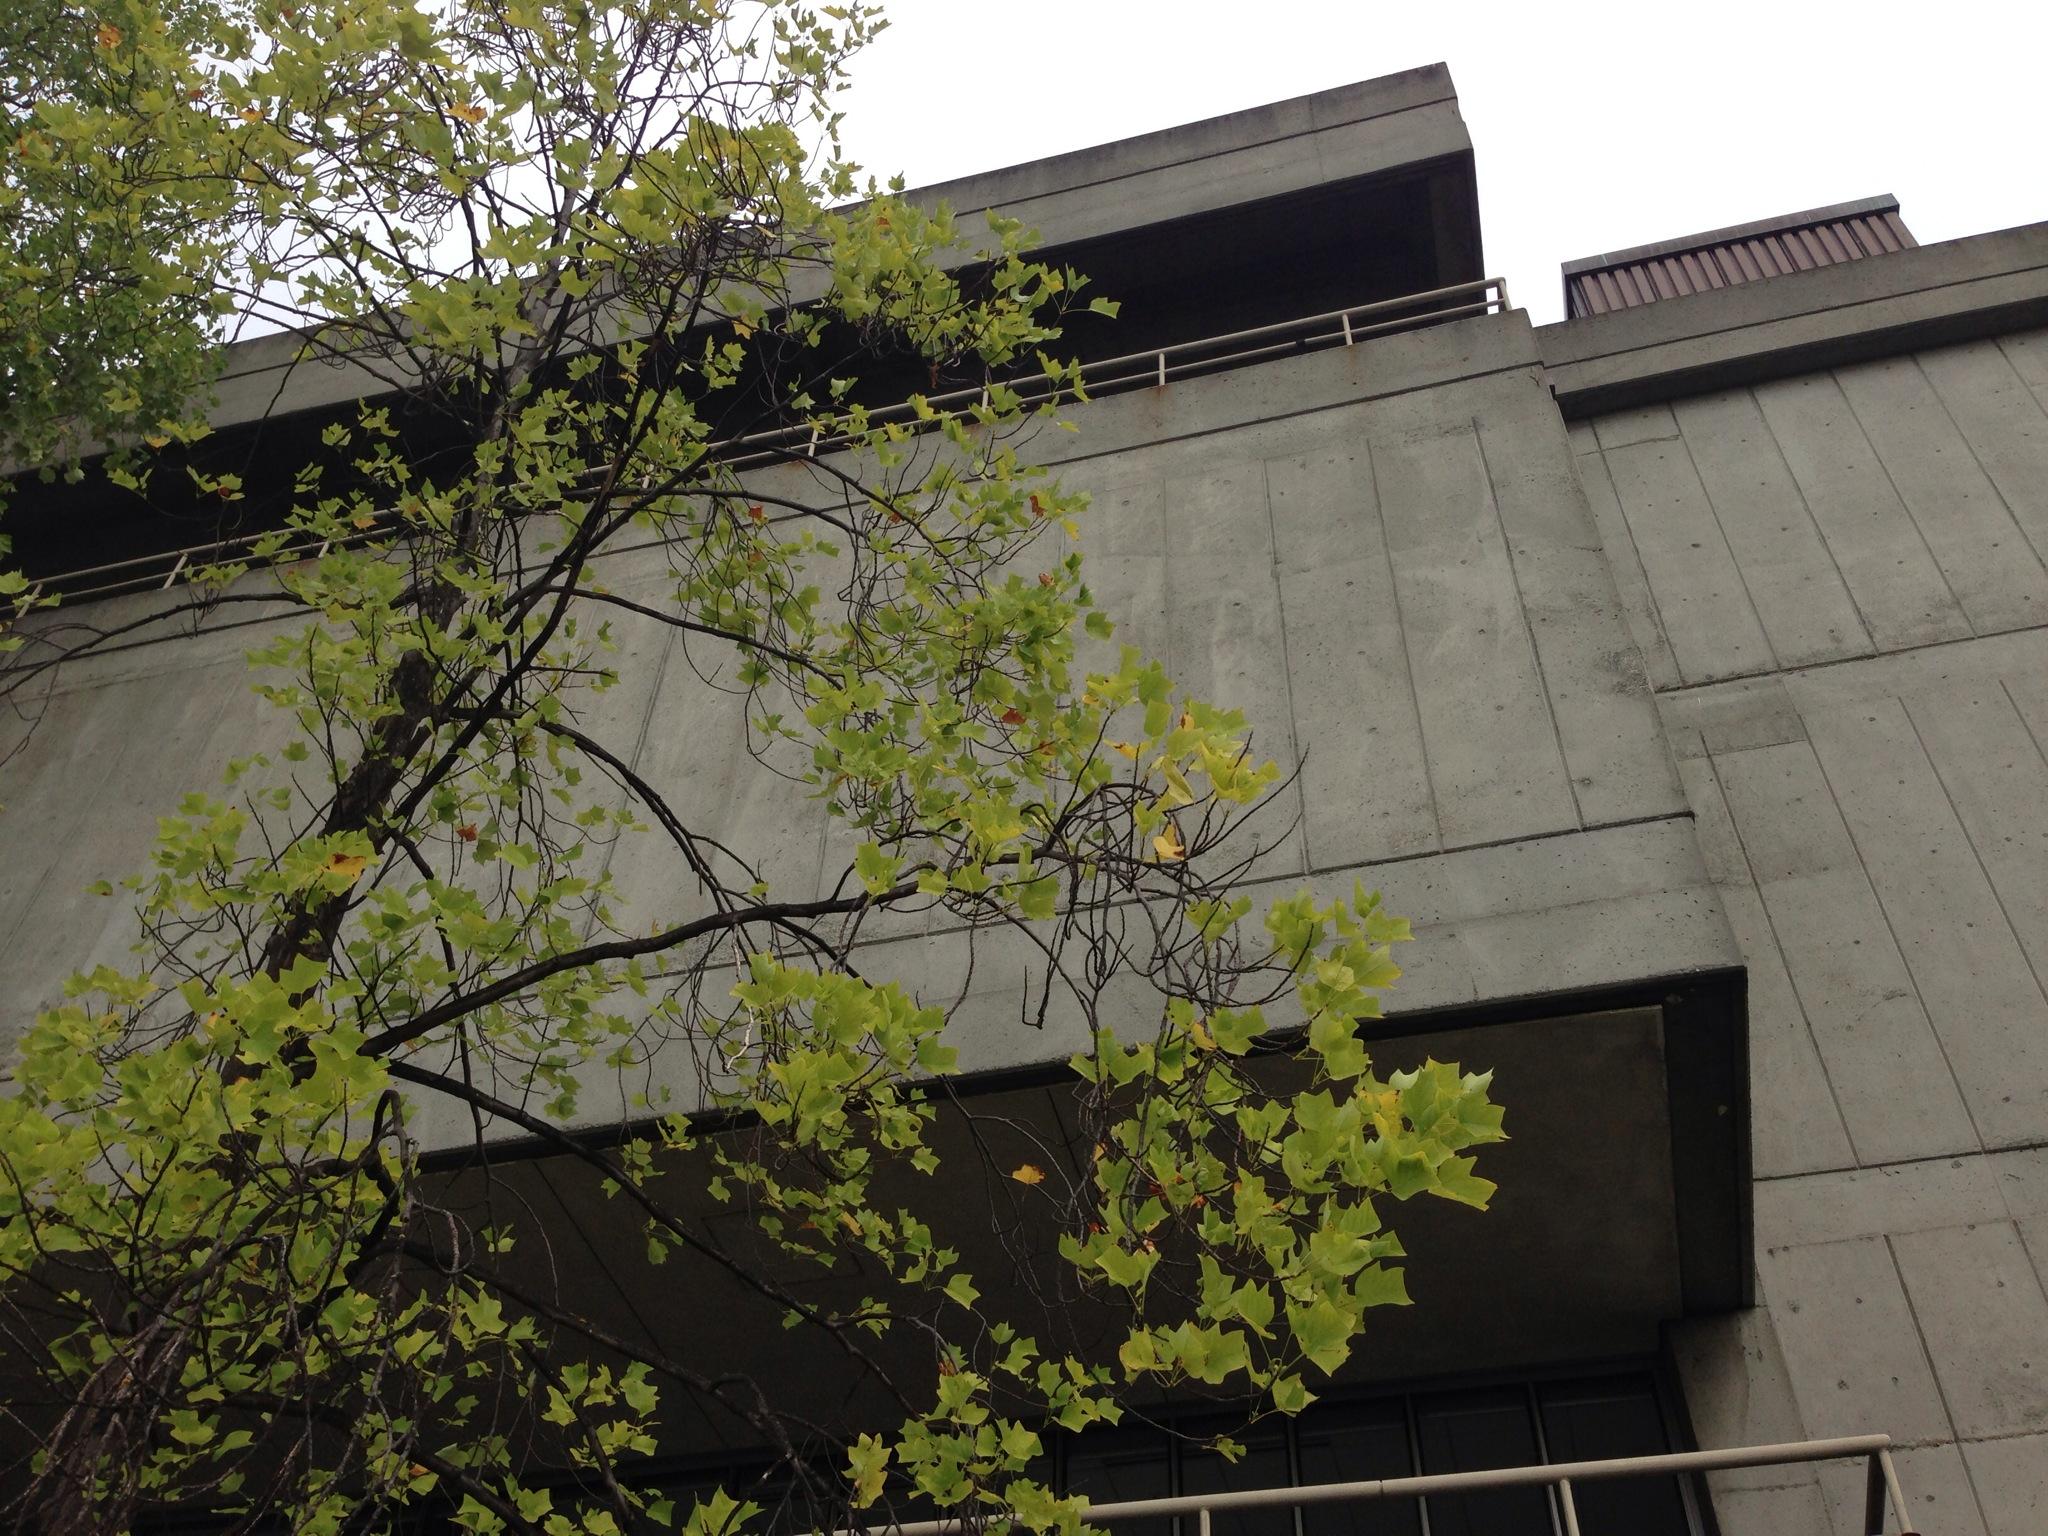 UWashington070Gould.jpg